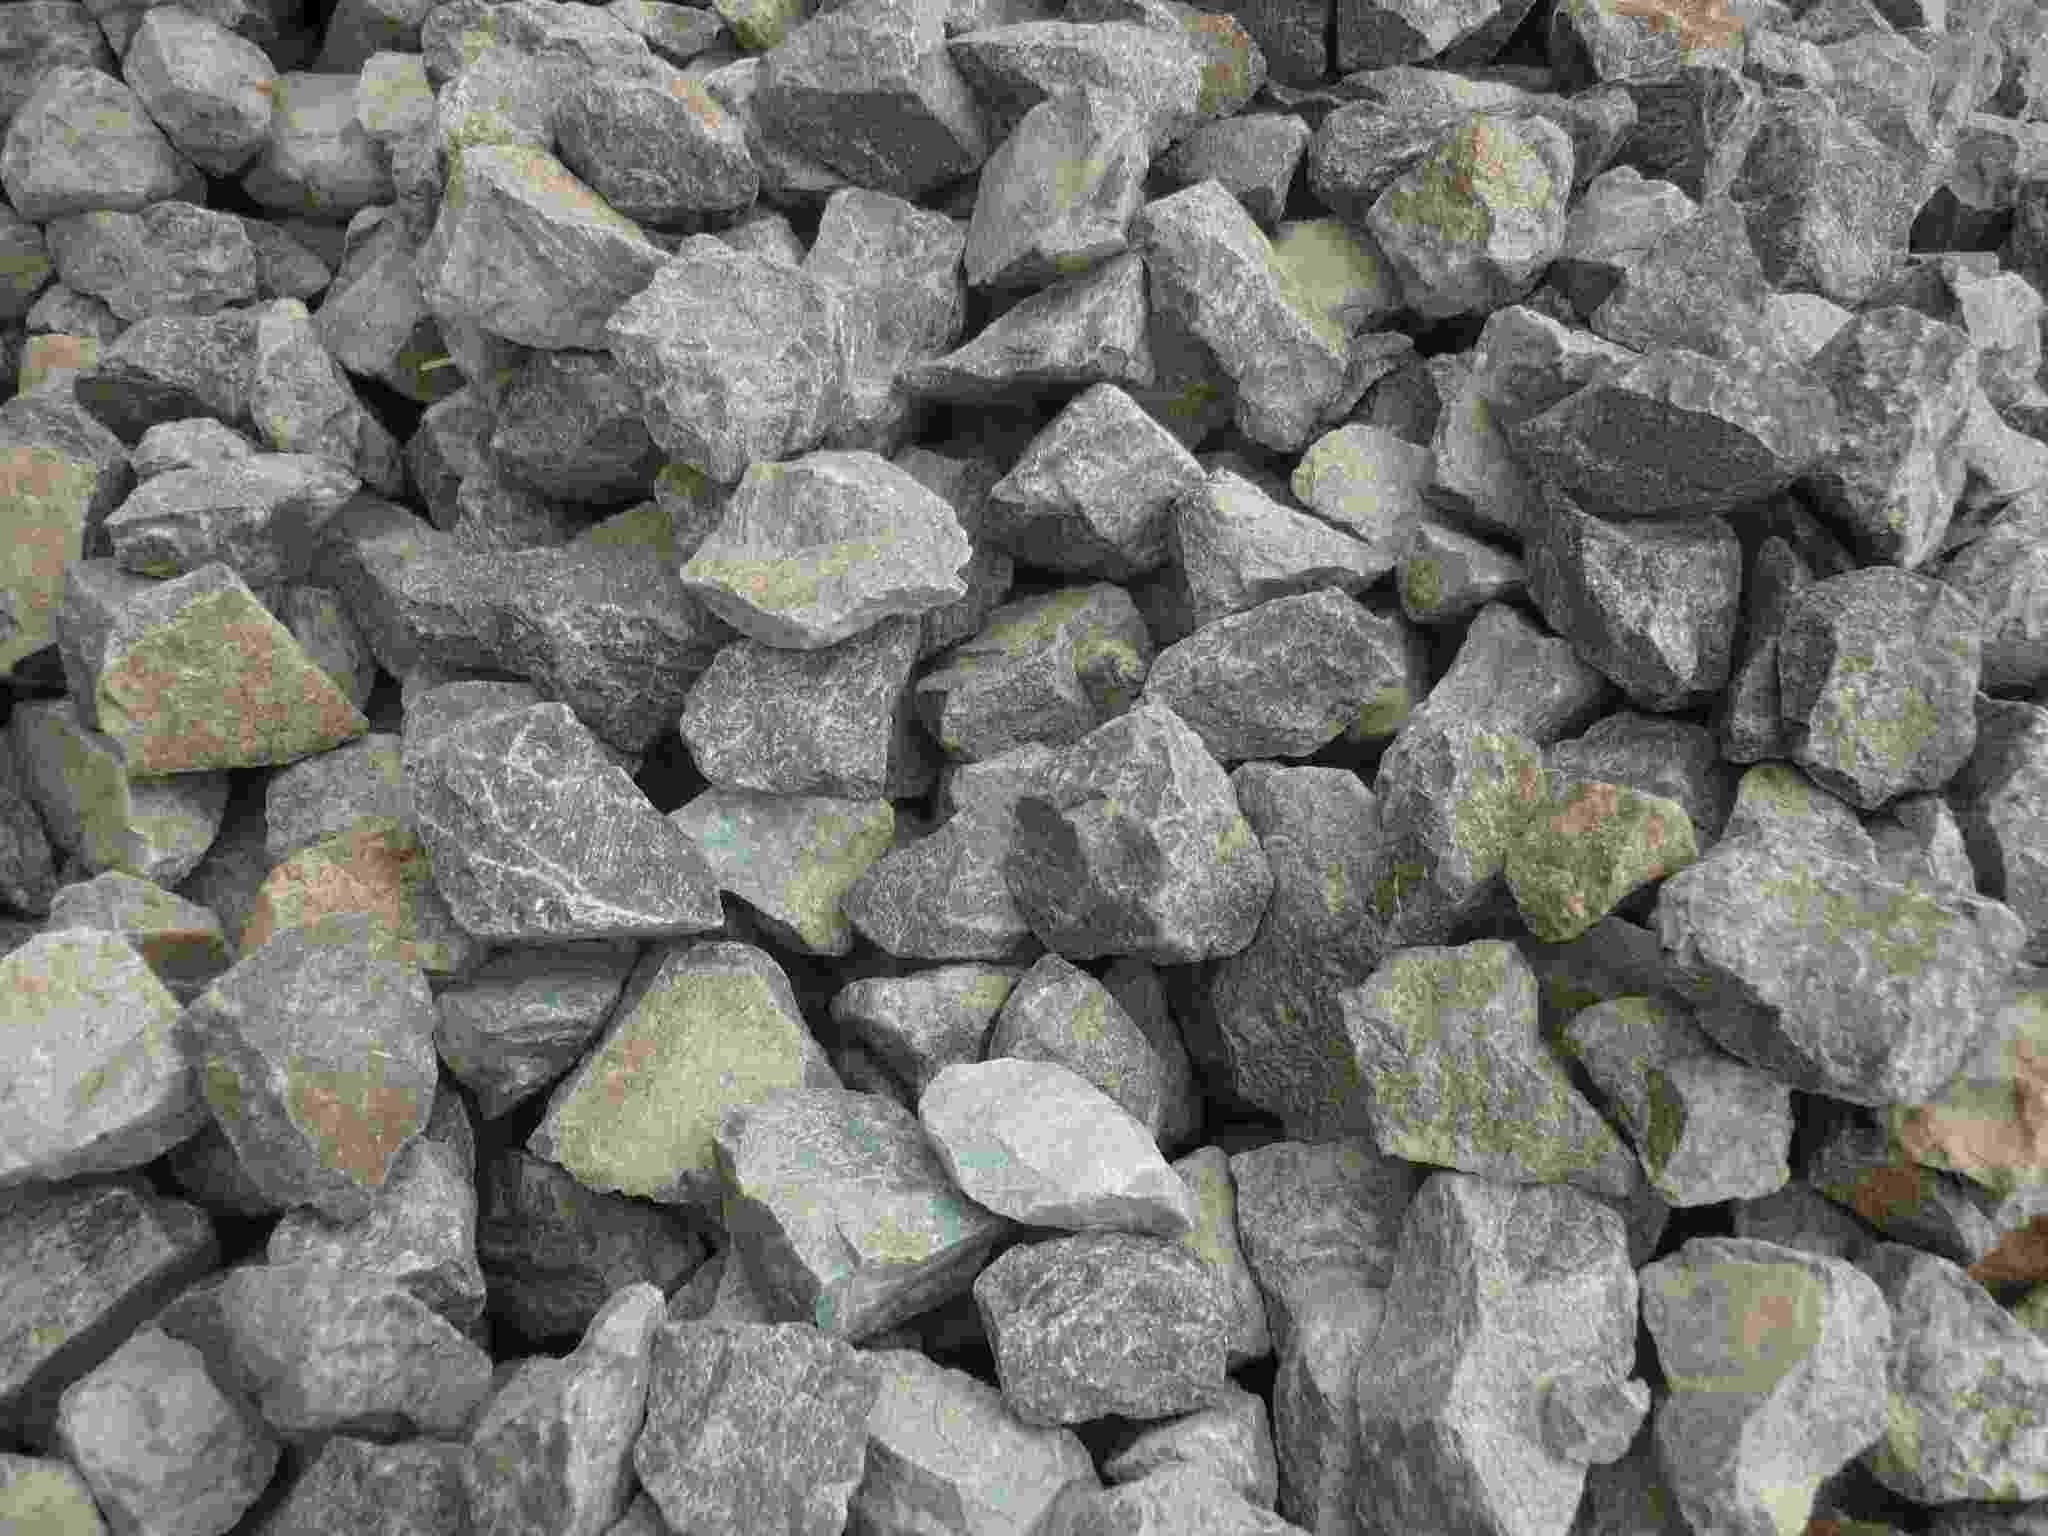 China Basalt Stone Construction Of Gravel Railway Ballast